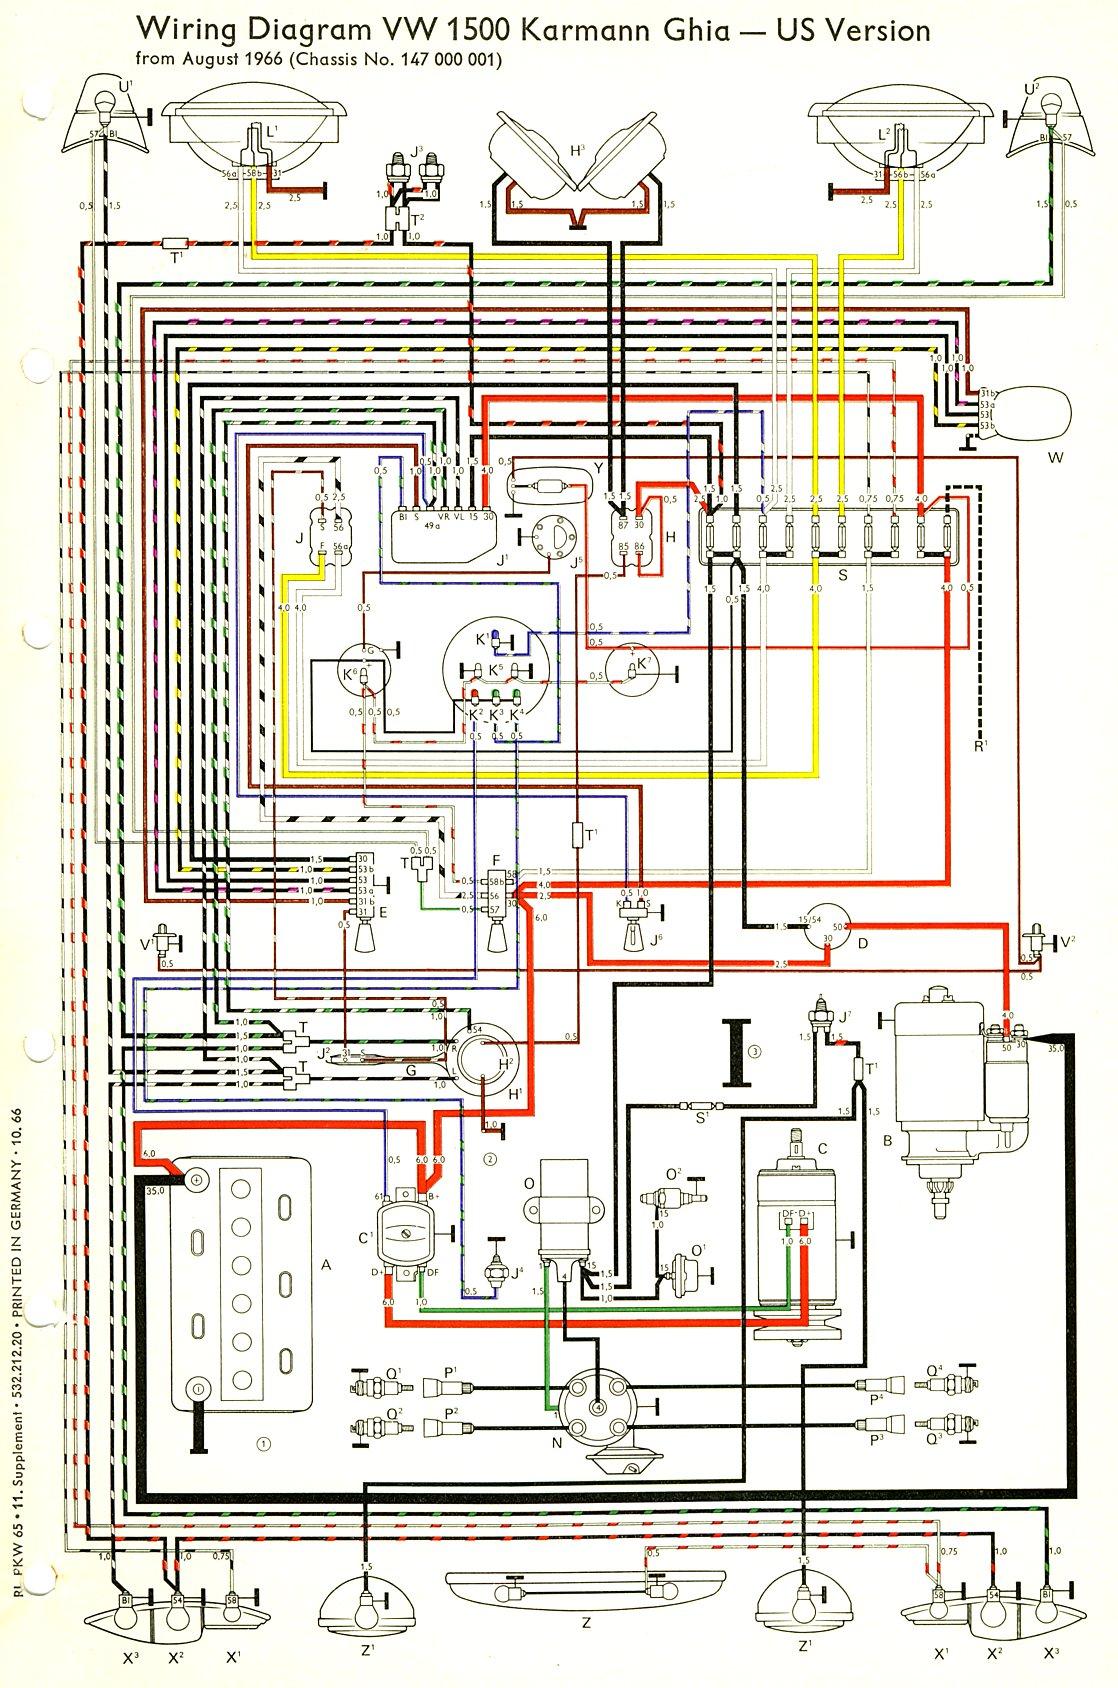 1967 vw karmann ghia wiring diagram